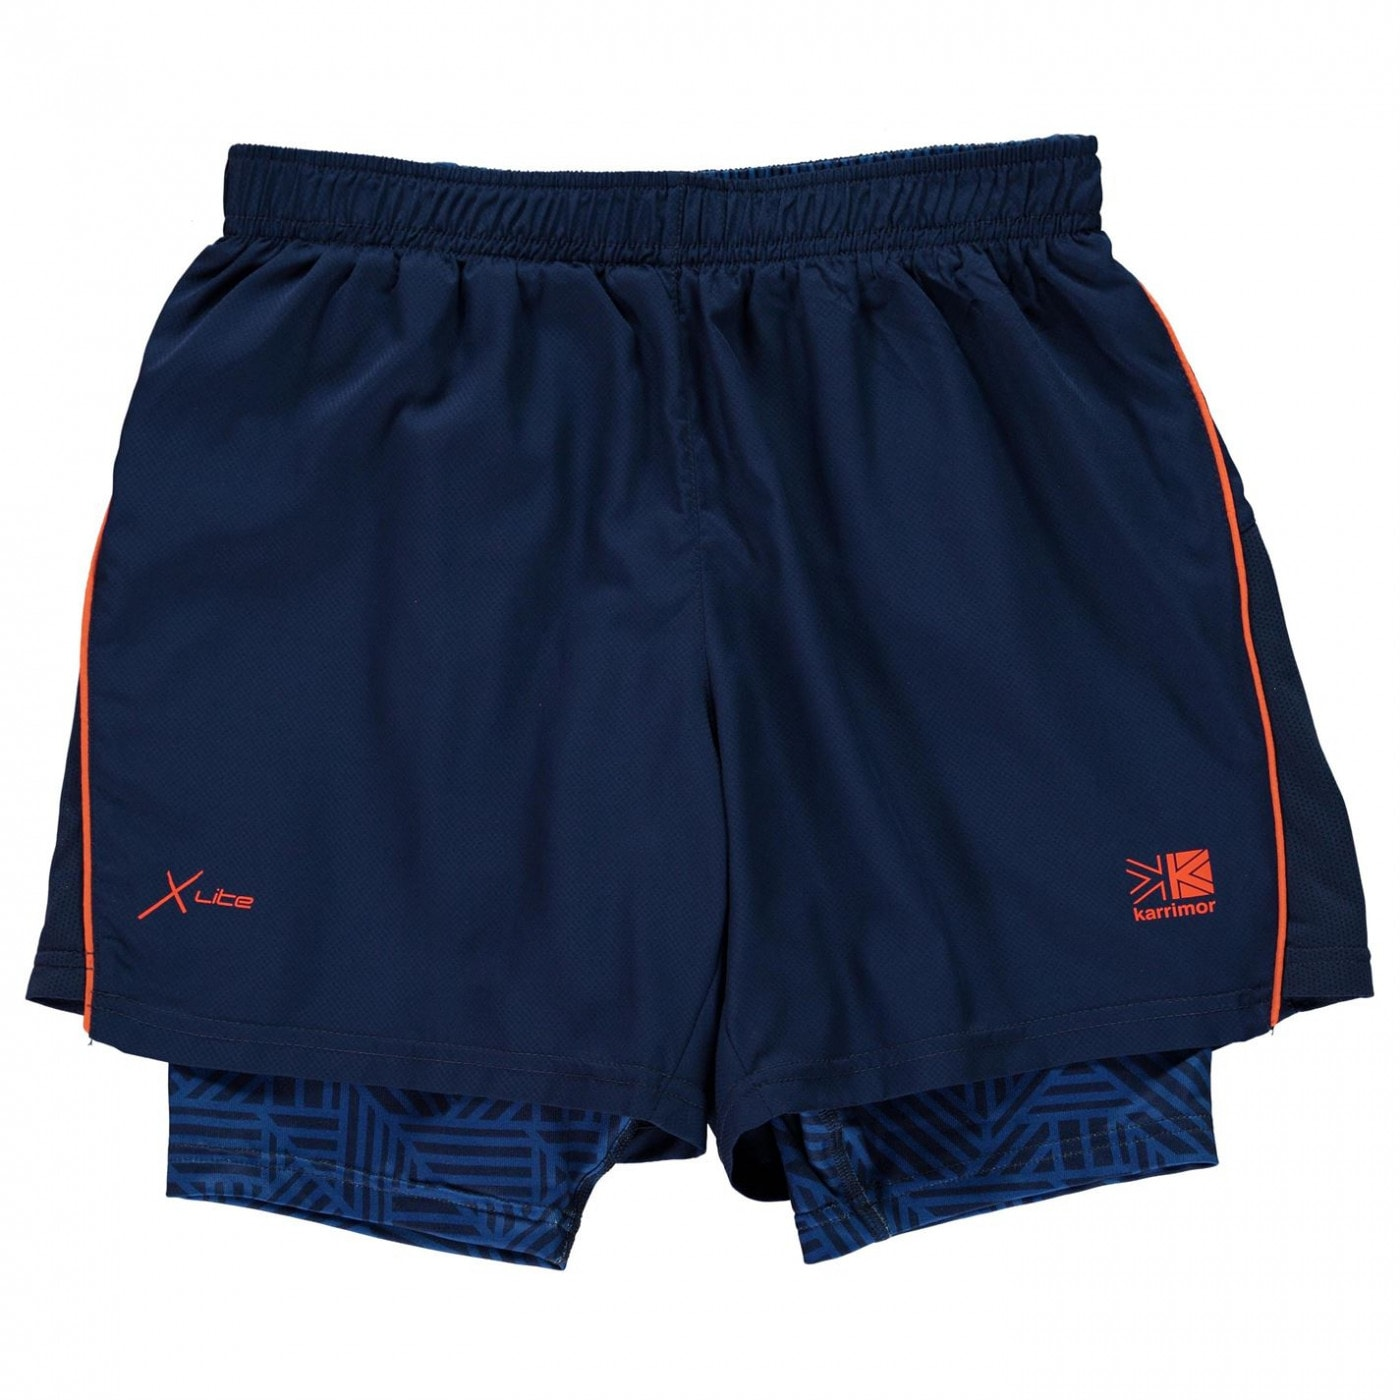 Karrimor X 2 in 1 Shorts Junior Boys